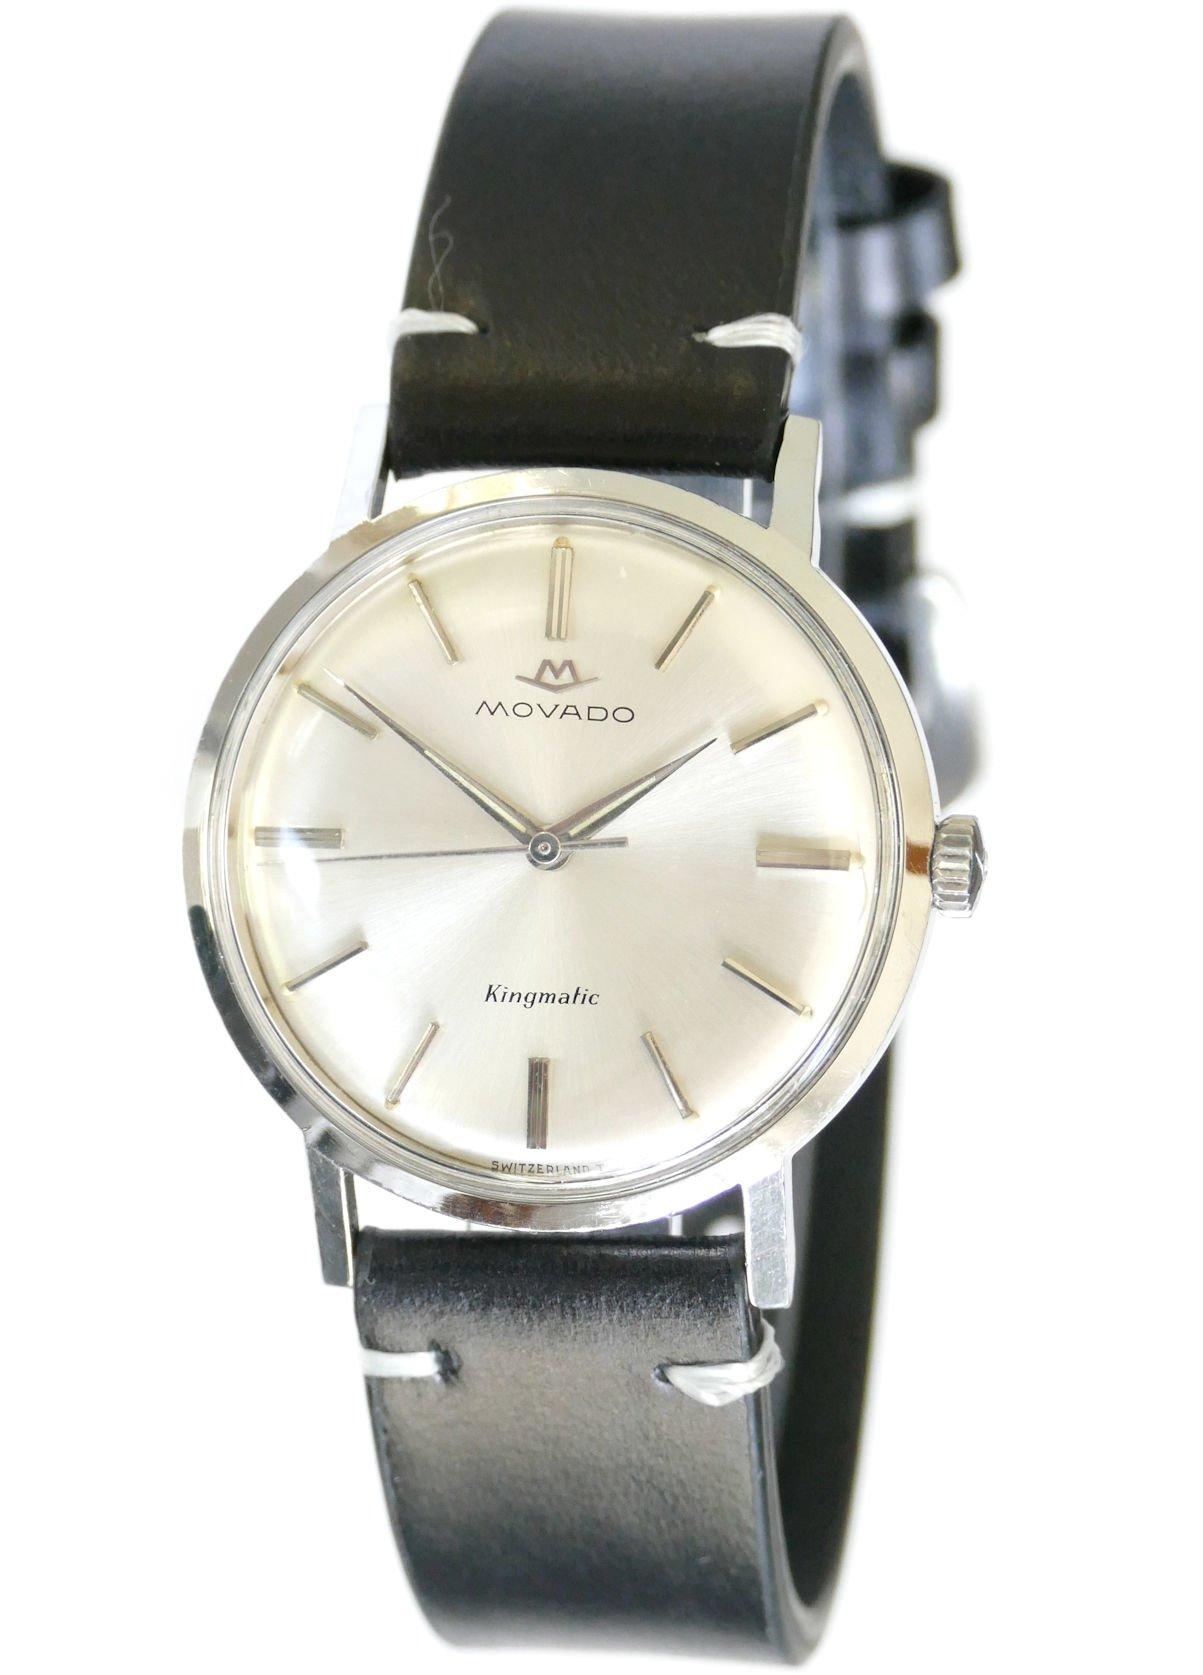 Movado Kingmatic S watch movement cal.388 Running. - YouTube